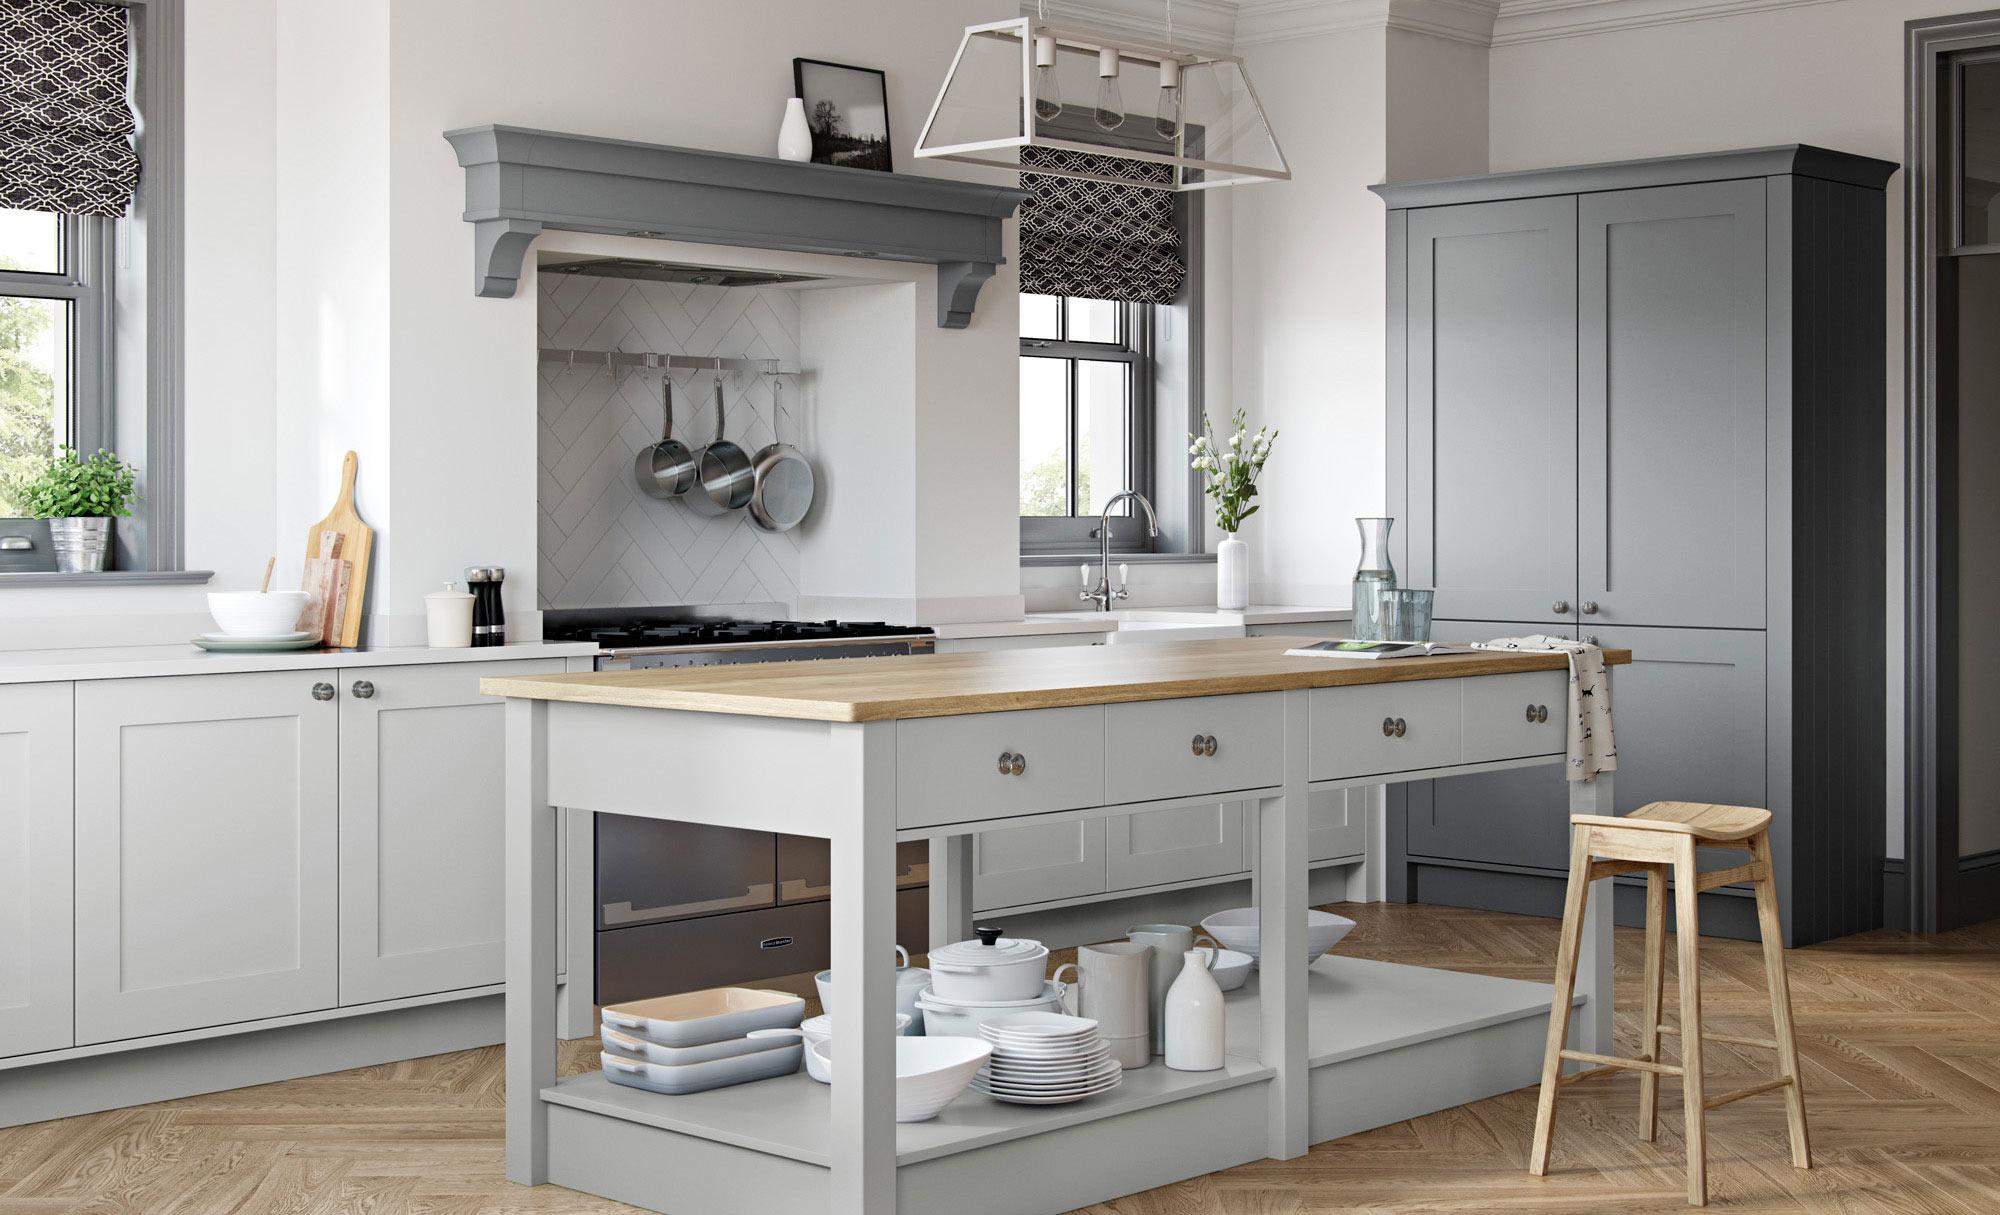 Uform Georgia Light Grey & Dust Grey  Kitchen